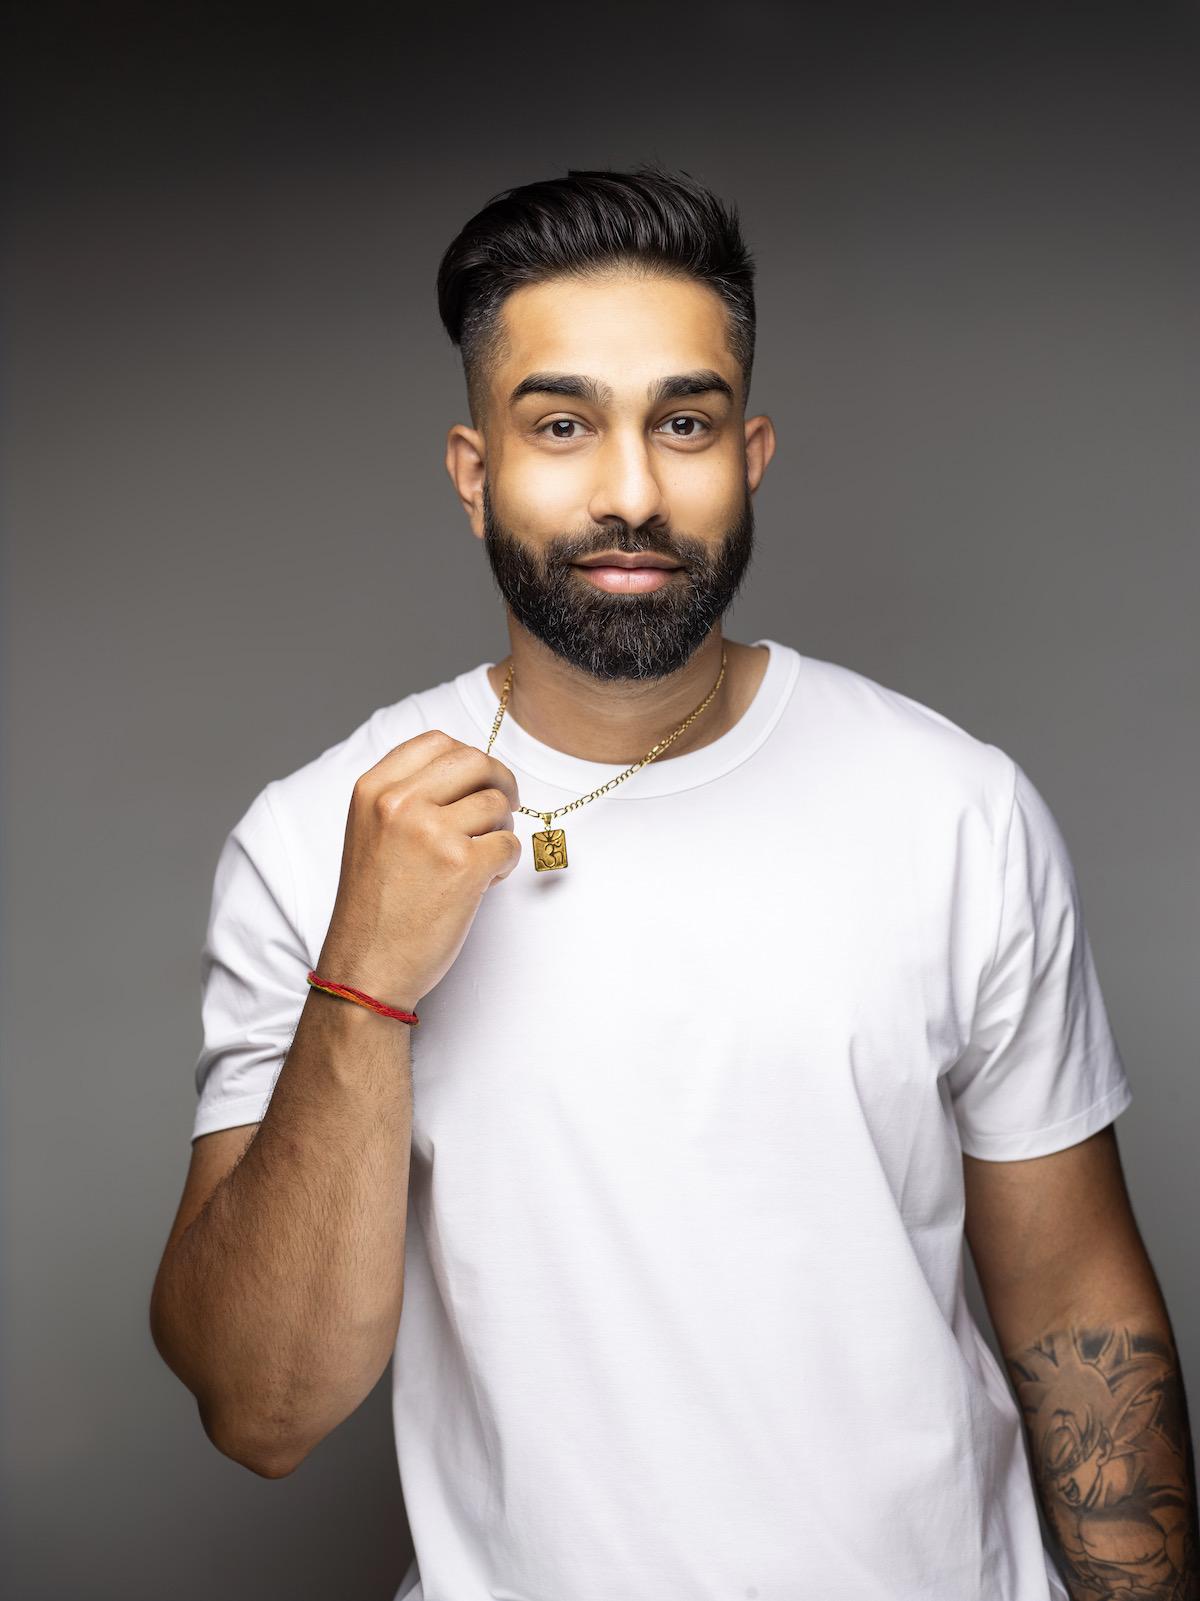 Navin-Ramharak-entrepreneur-Canada